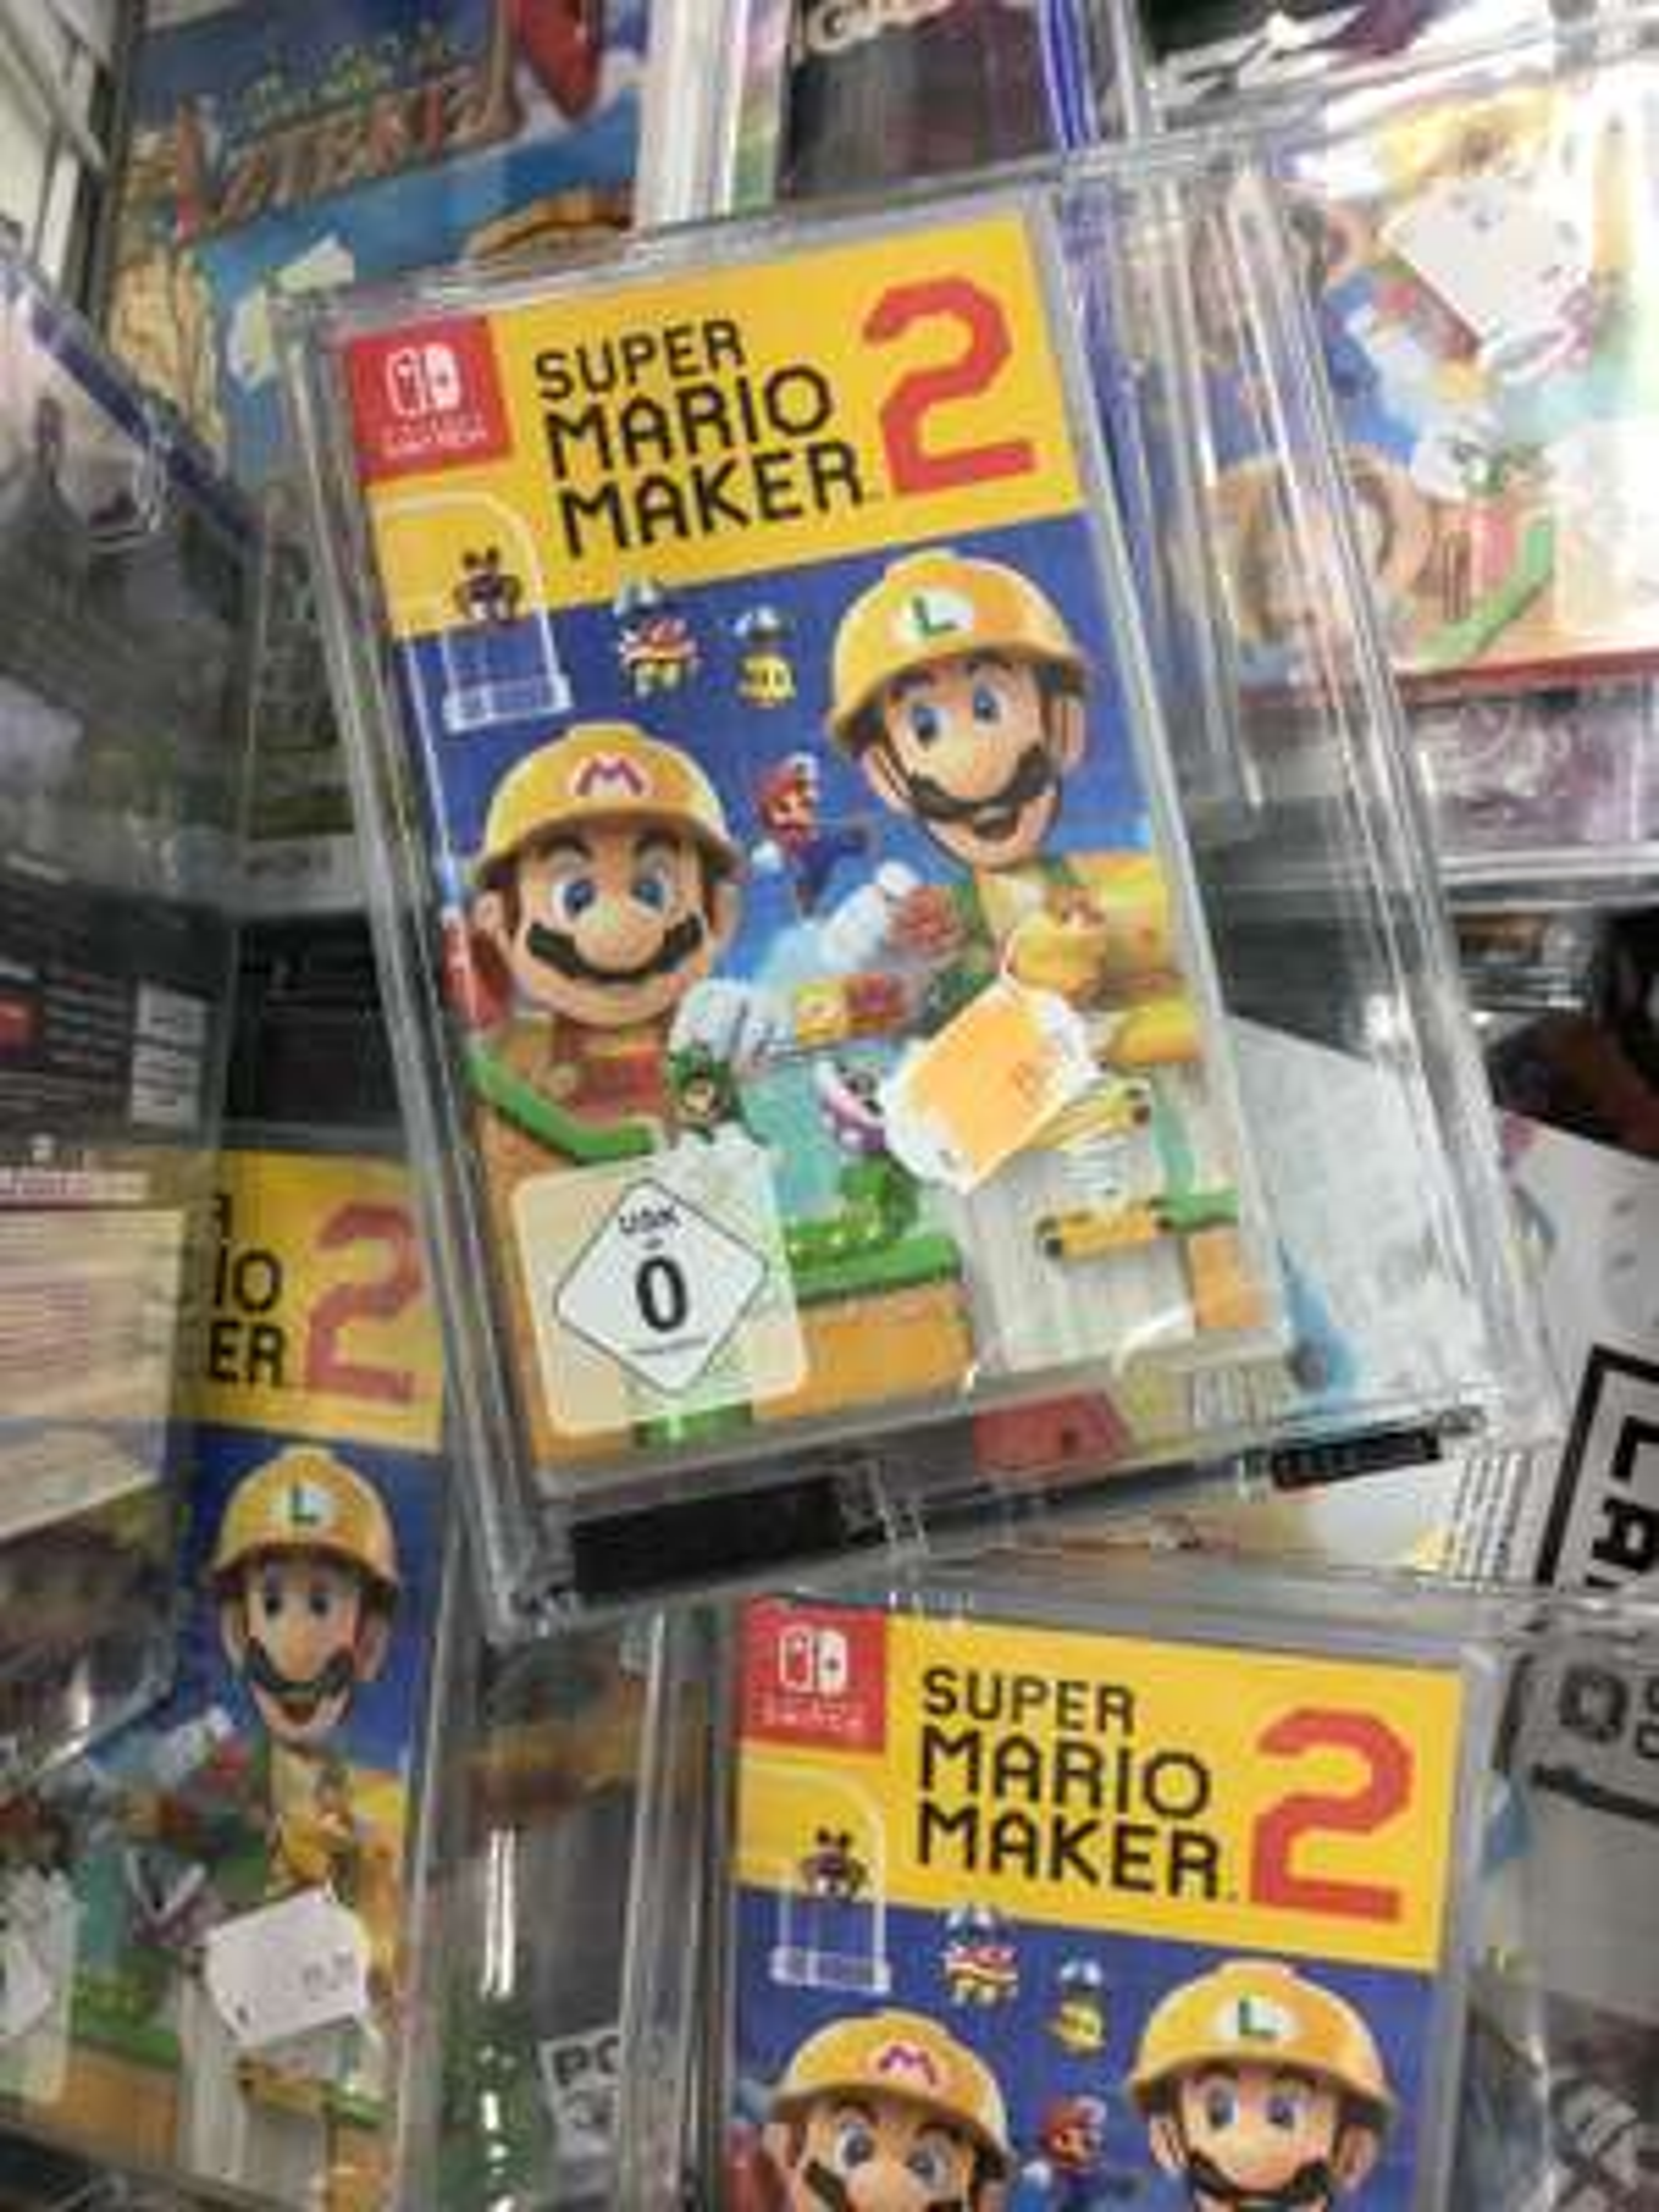 [LOKAL] Saturn Leipzig Hbf / Nintendo Switch Super Mario Maker 2 für 29.97 € / PS4; XBOX Borderlands 3 je 9.99 €